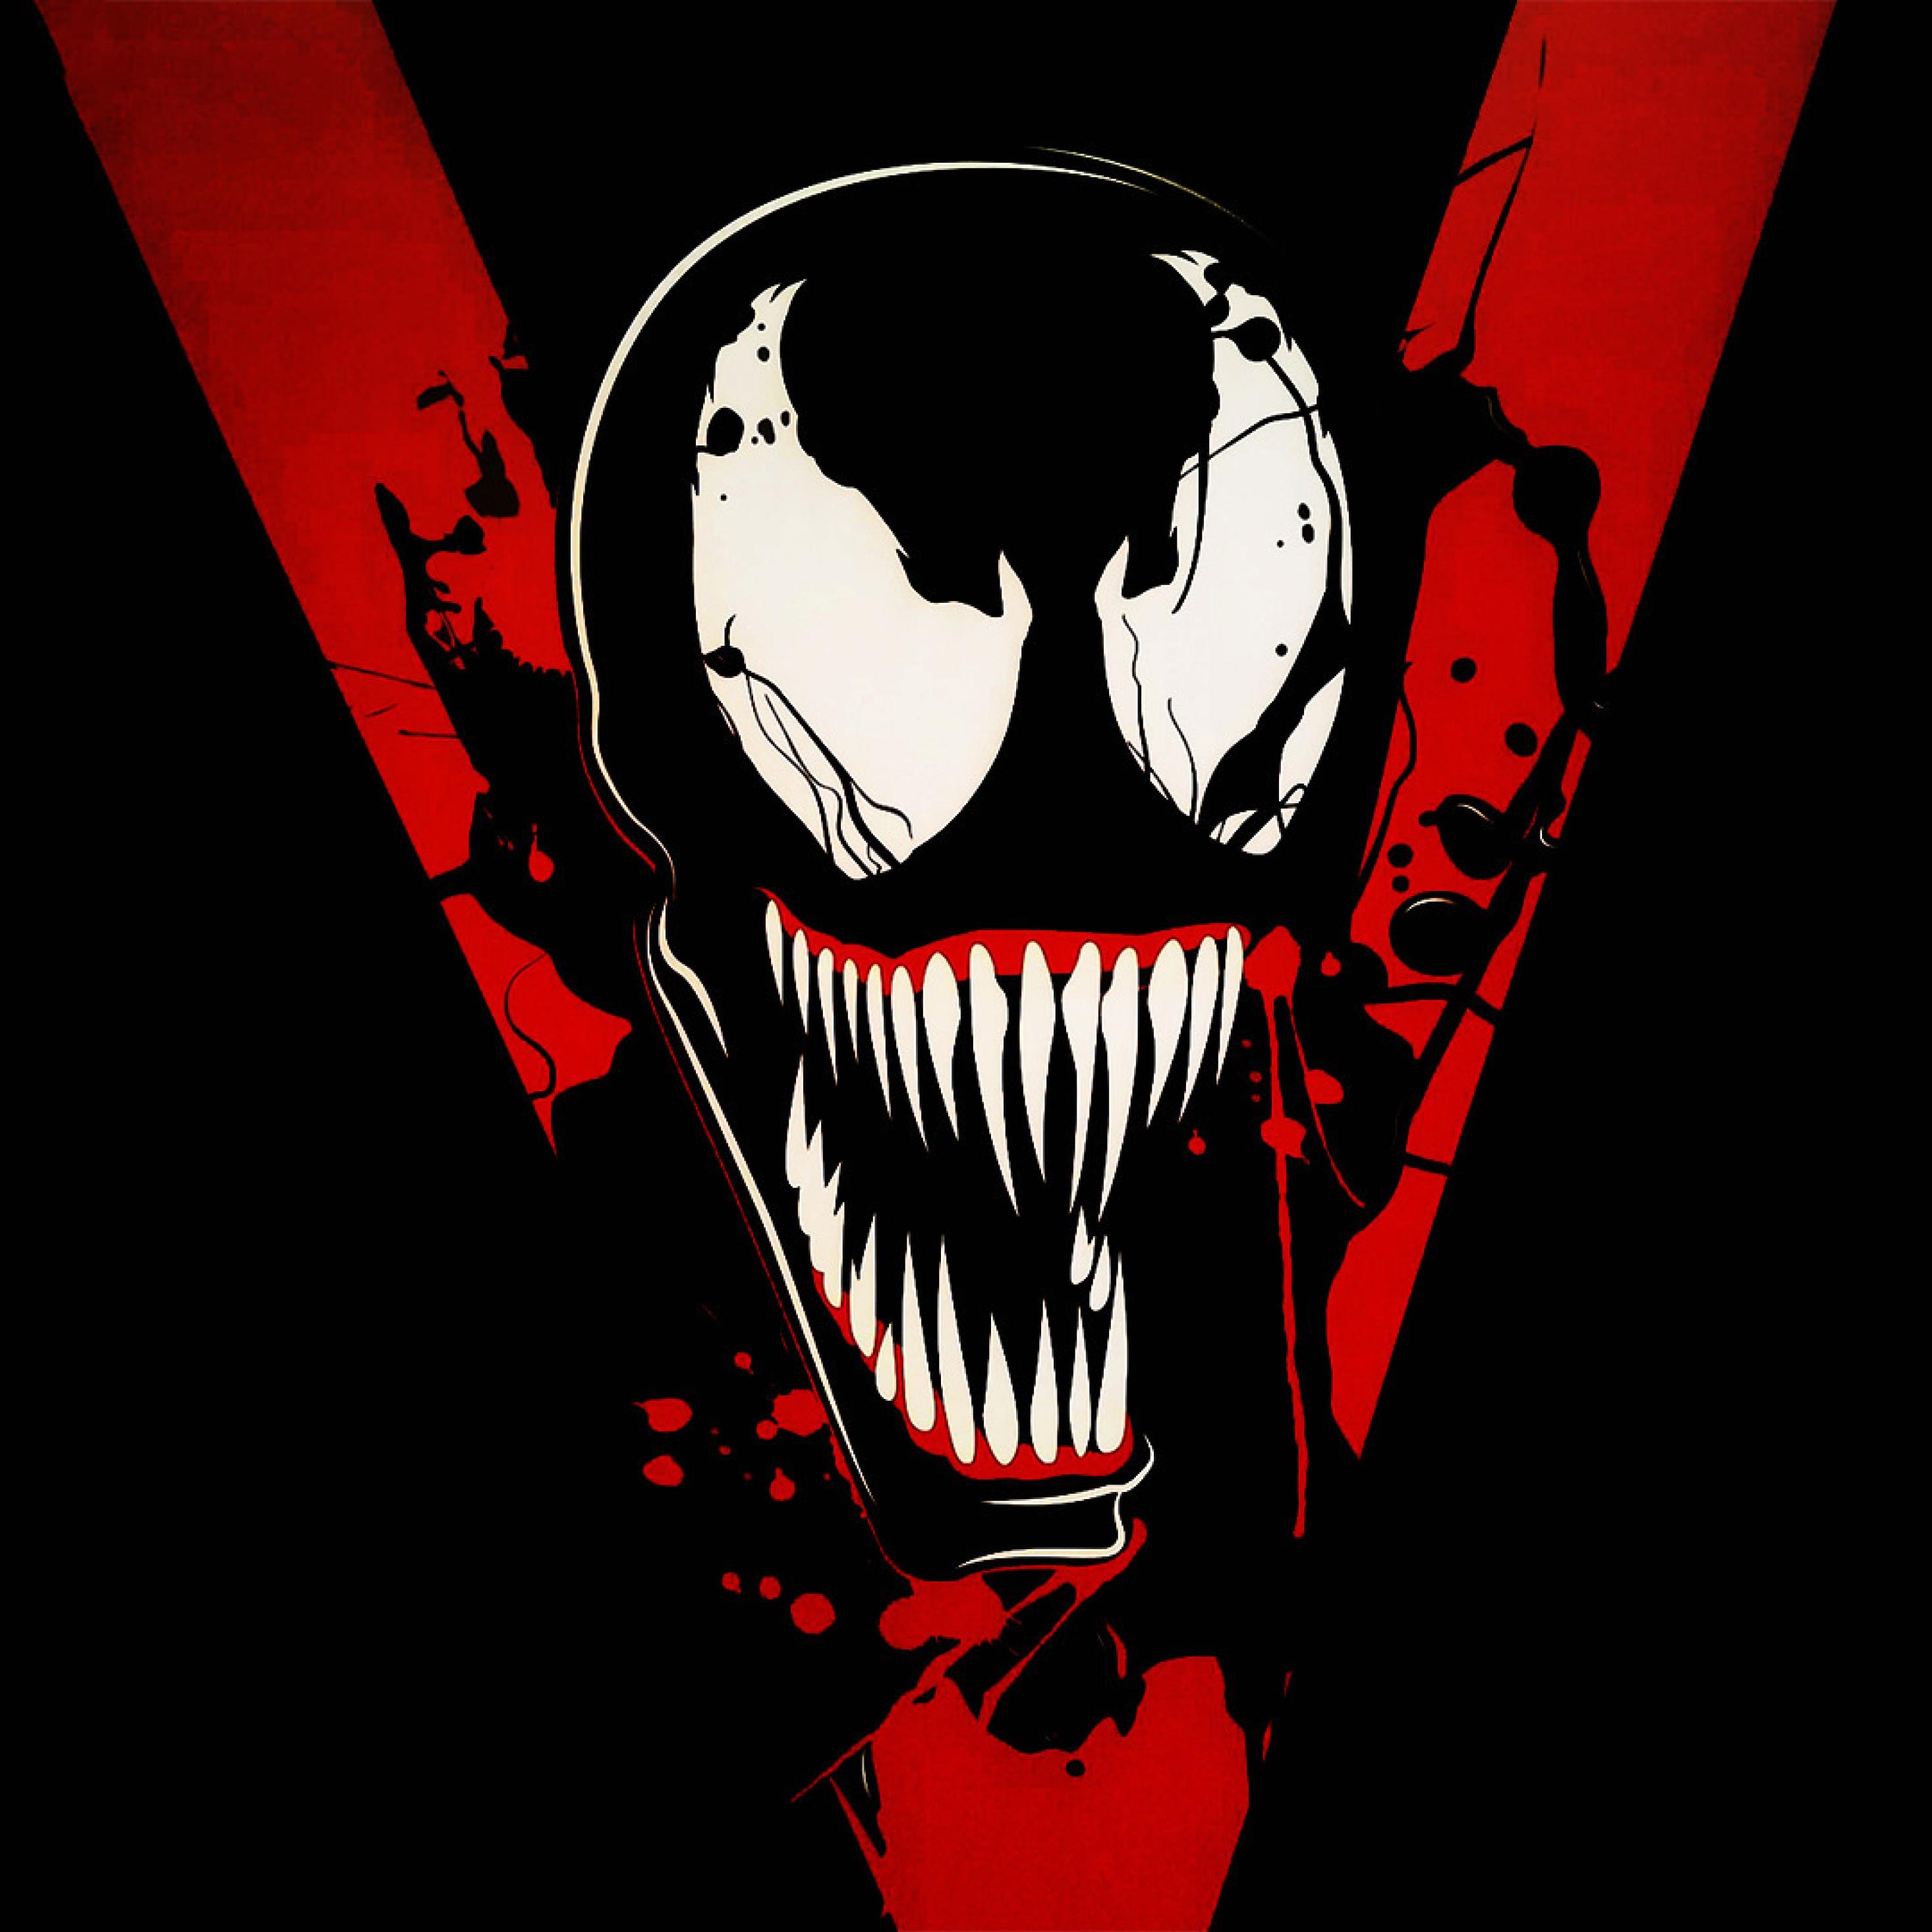 Venom Mp3 Free: Venom Hibry Pictures Free Download